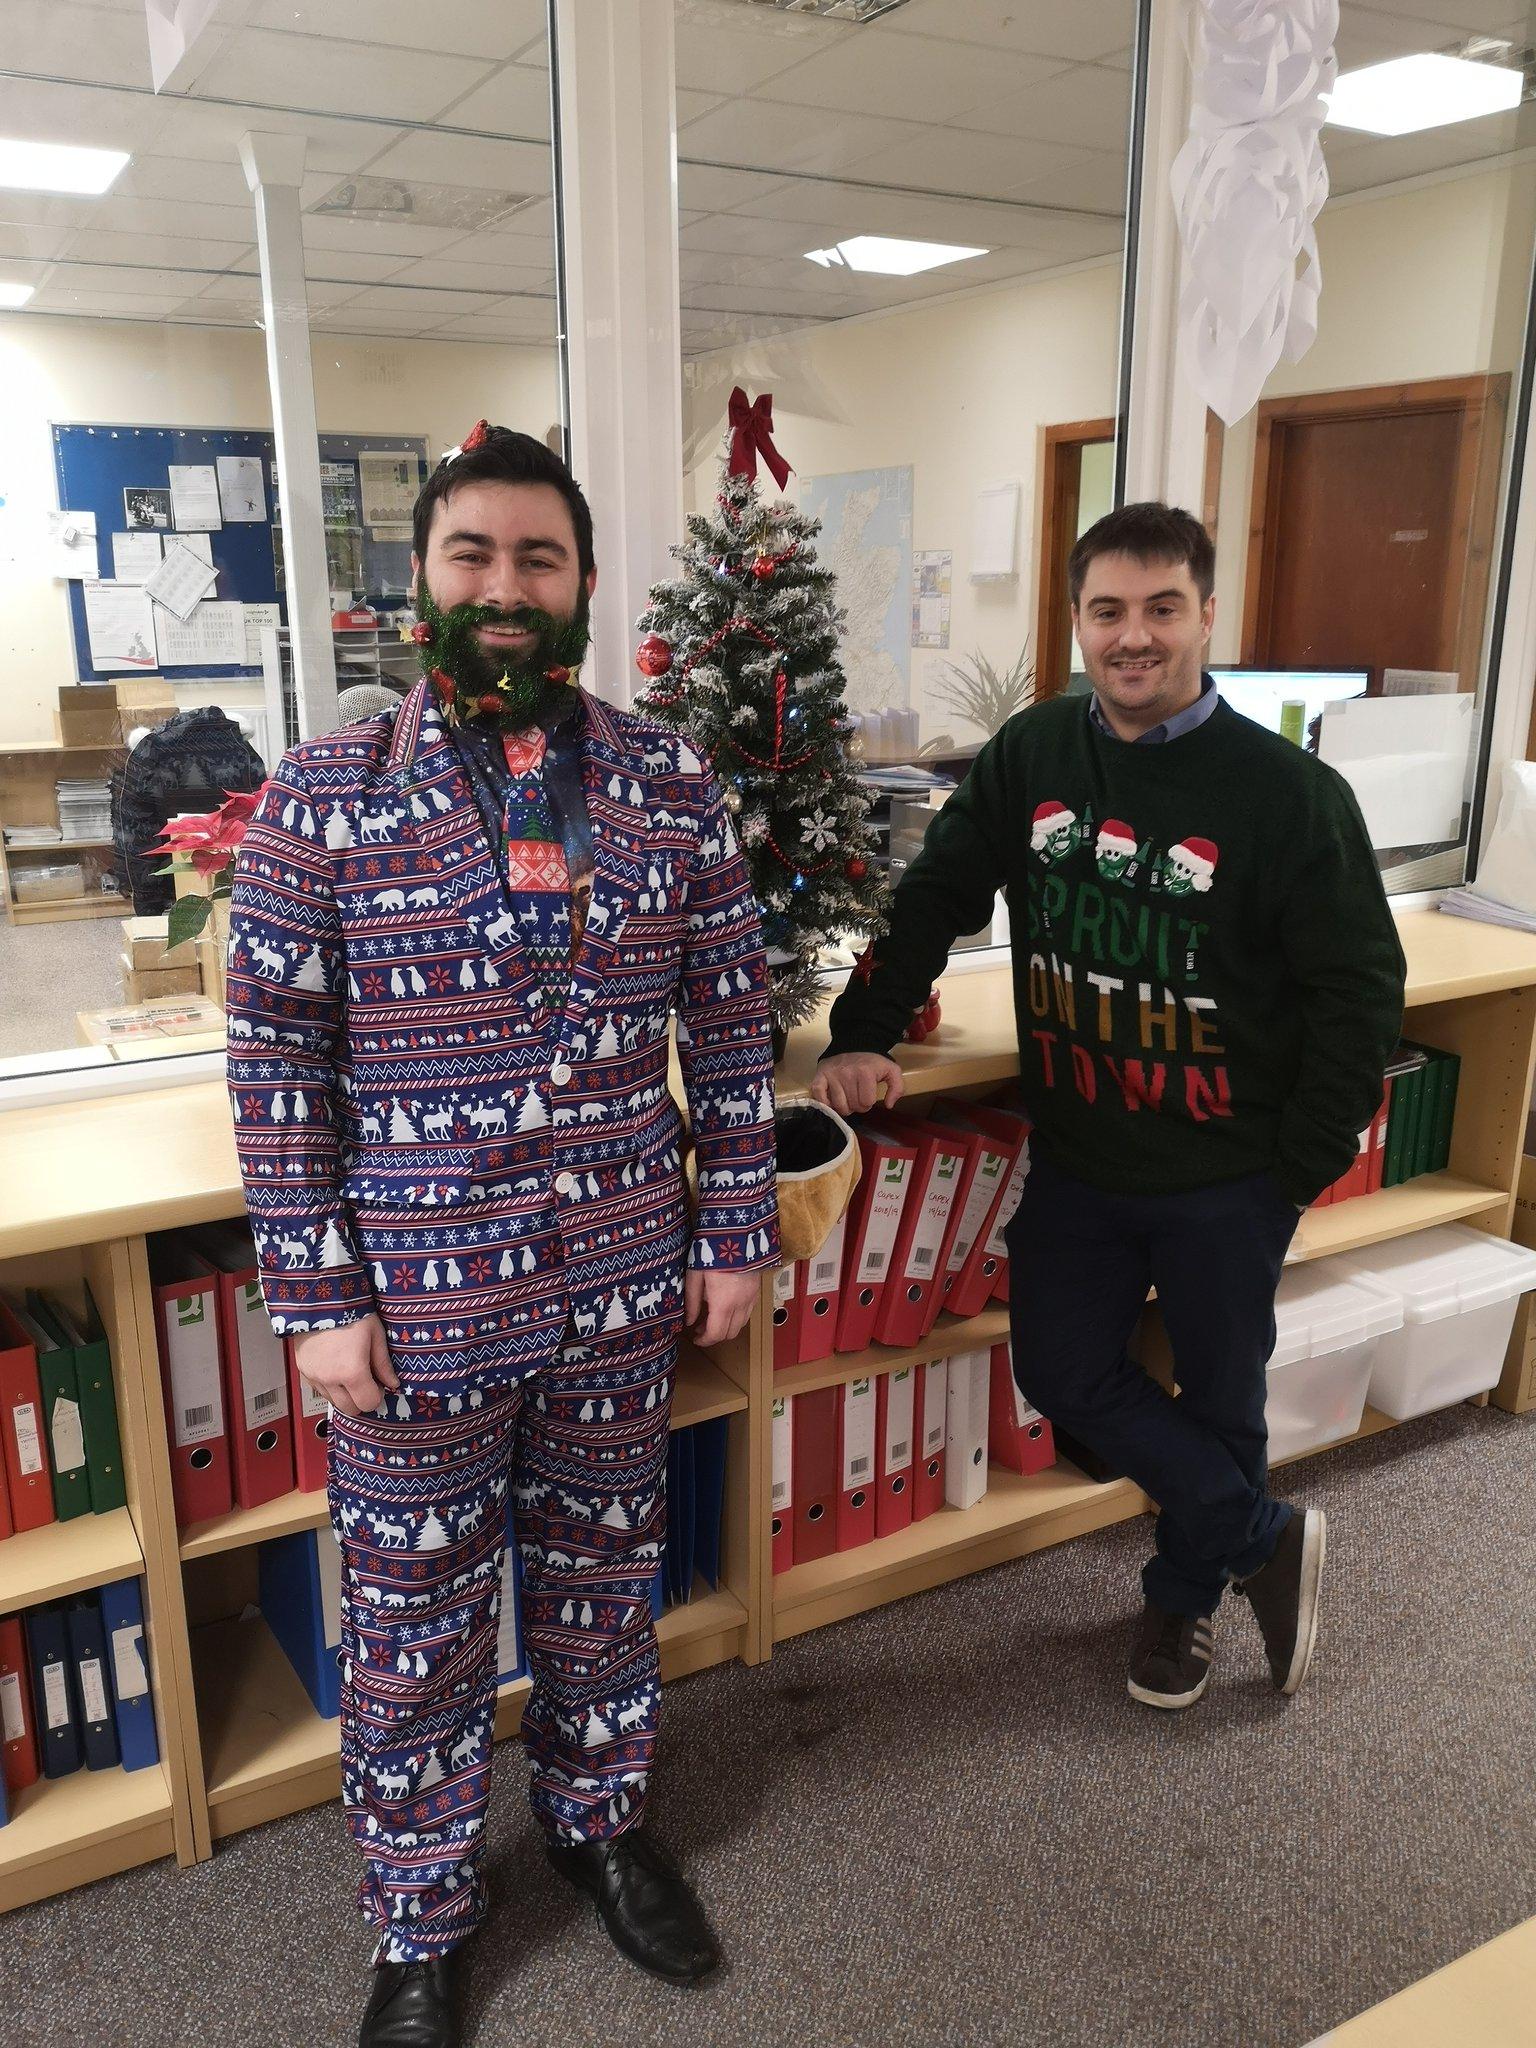 Sidey are Raising money for @tayfm  Cash for kids by having a Christmas Jumper Day today. Brilliant effort guys ???????????? https://t.co/emjkrdkko0